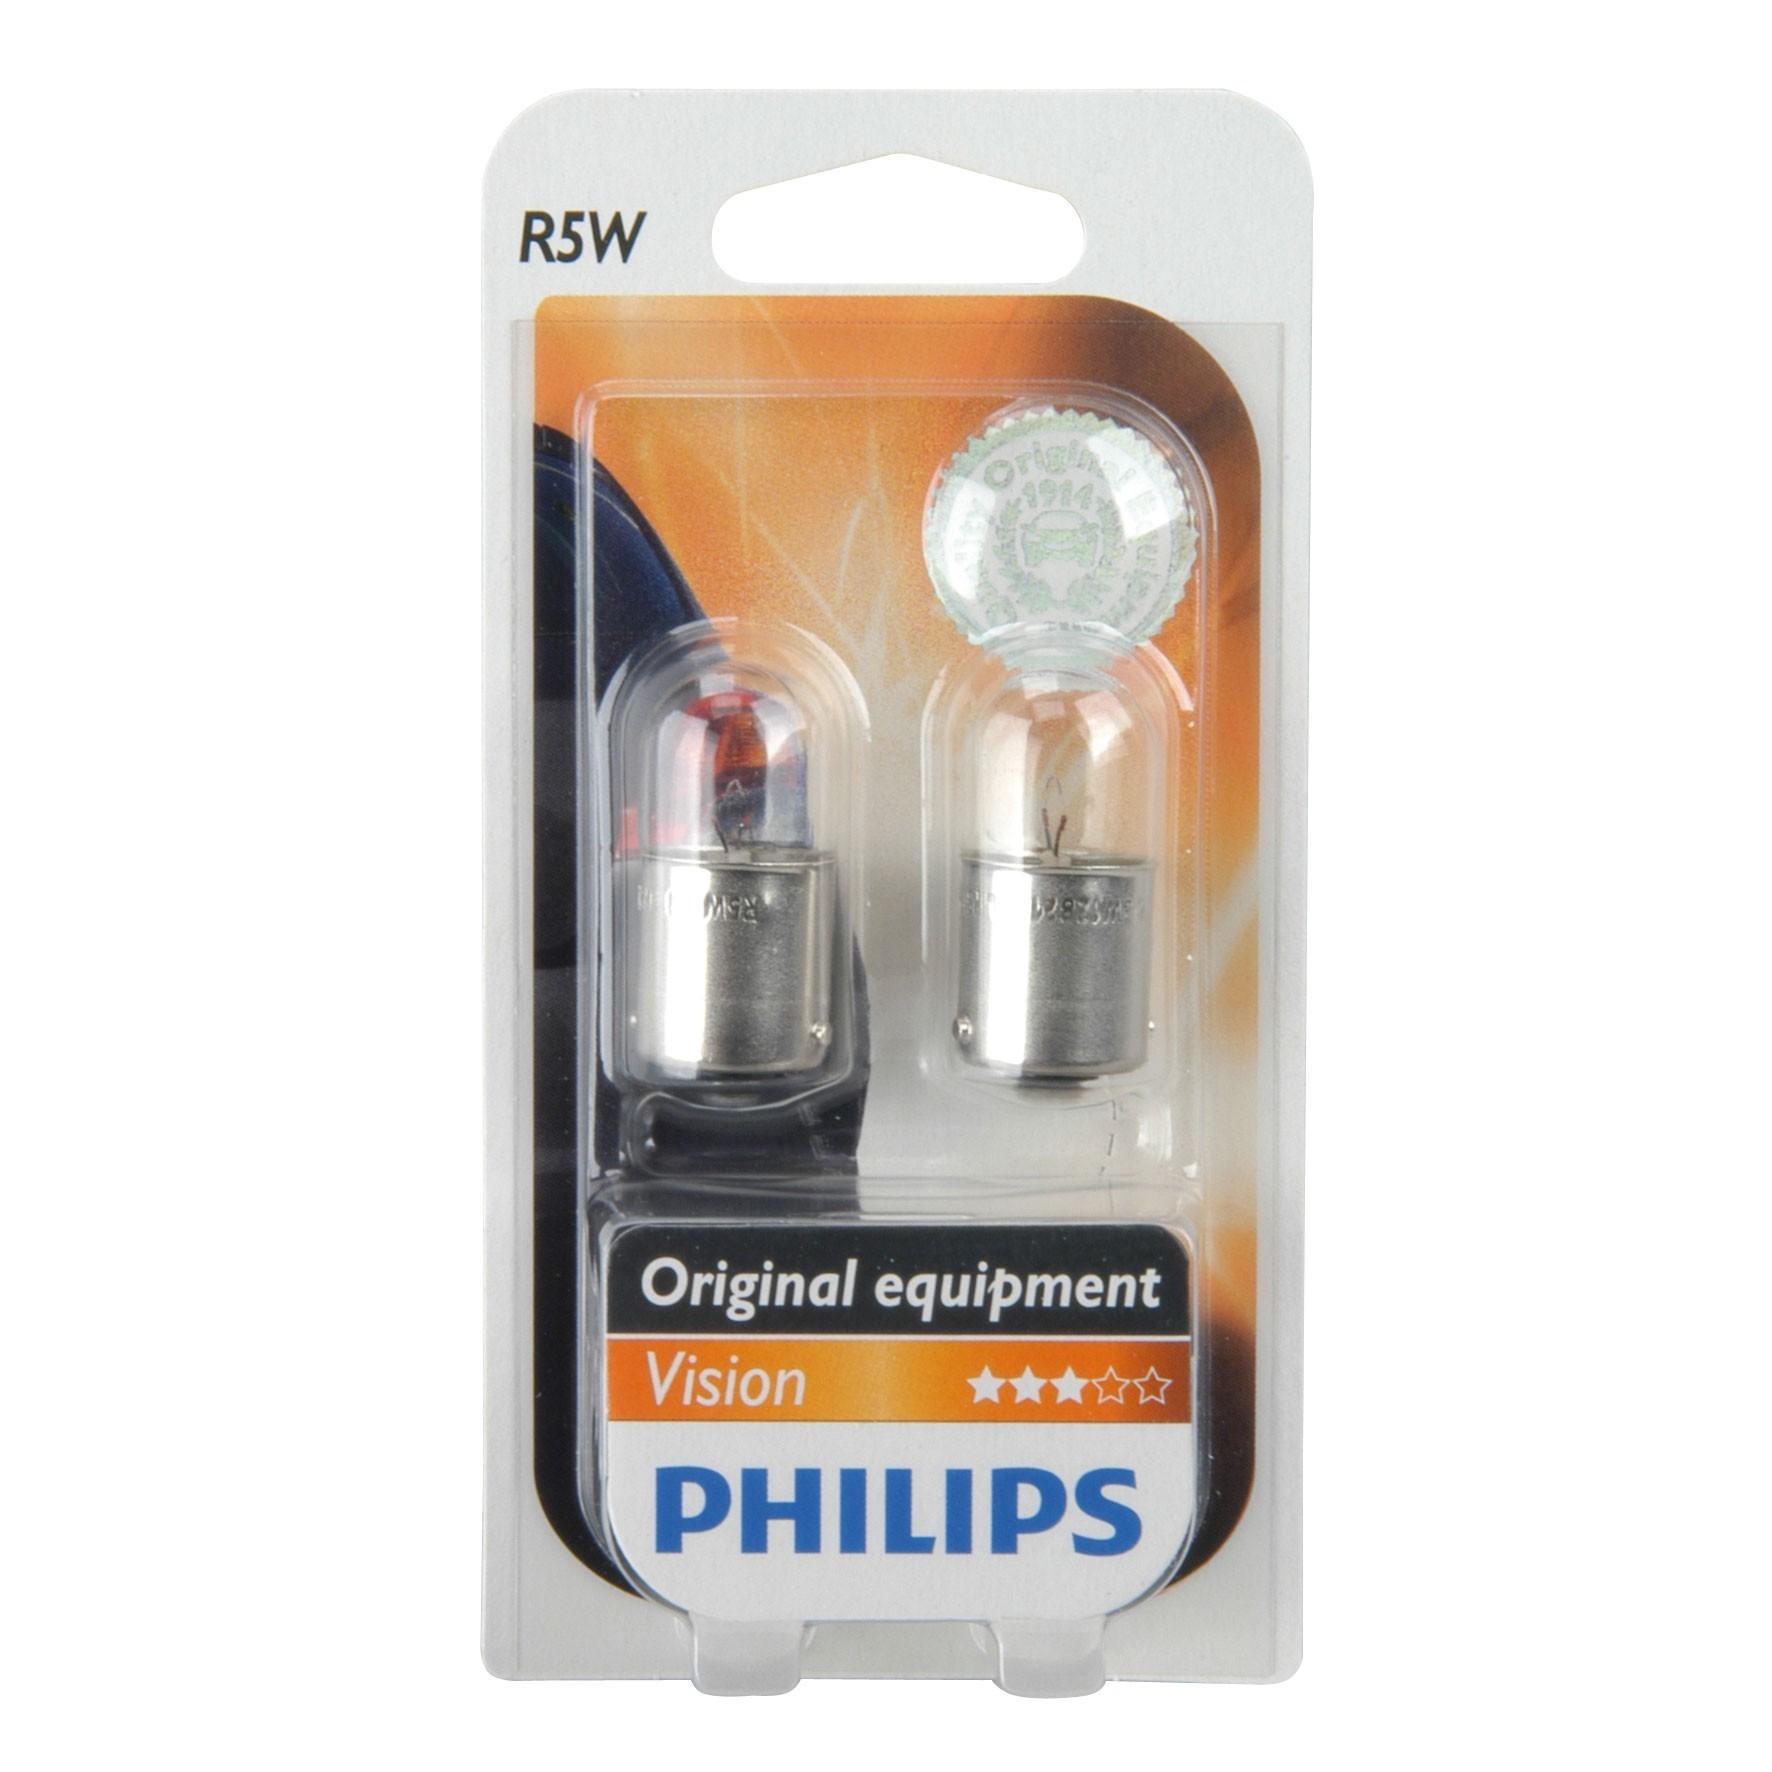 Philips Kugellampe R5W 12 Volt / 5 Watt 2er Pack - Autobeleuchtung Bild 1